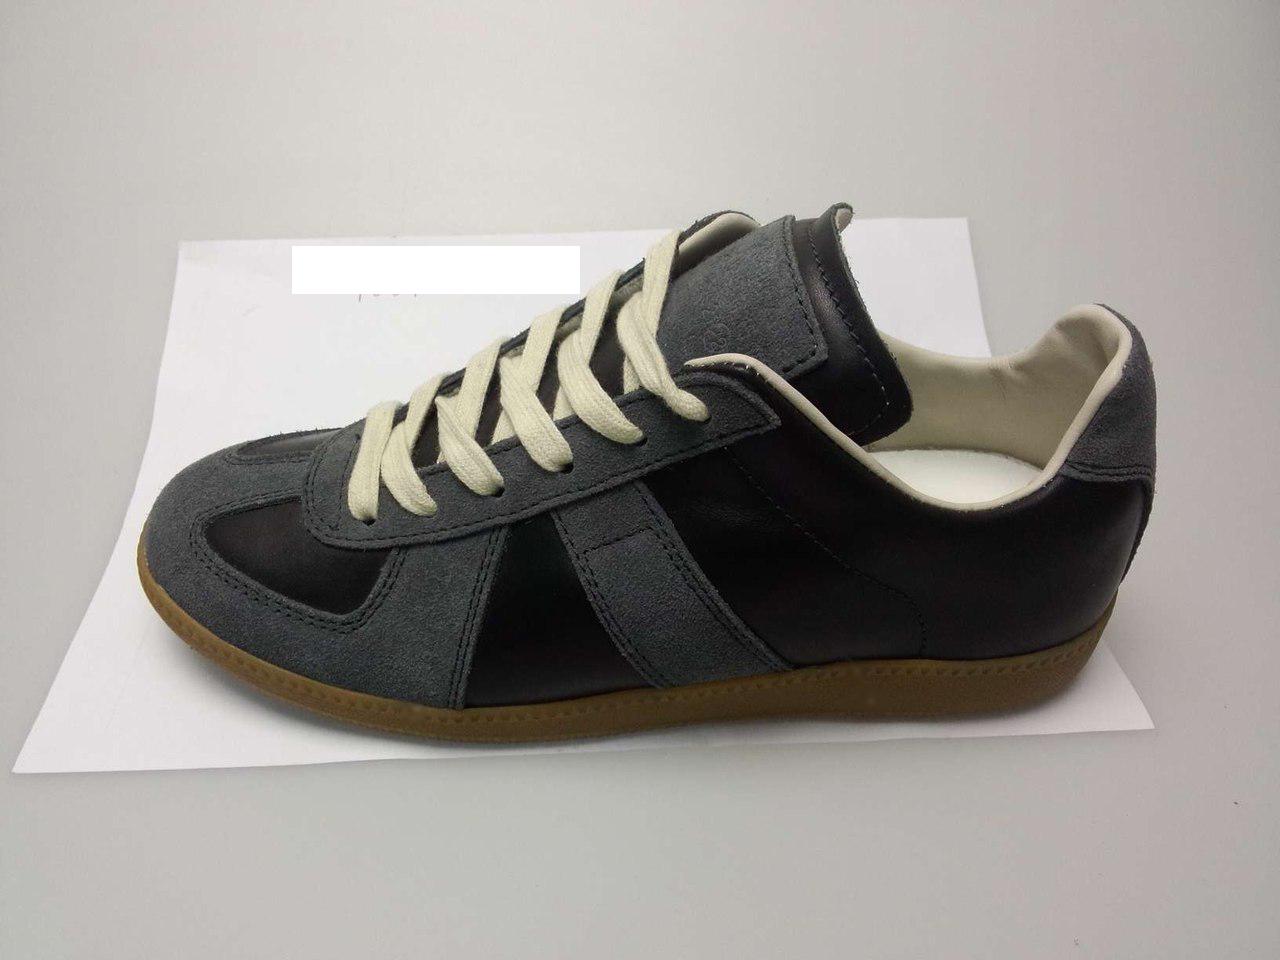 12ffc7445b3 is it original Maison Martin Margiela Sneaker or not ? | Styleforum